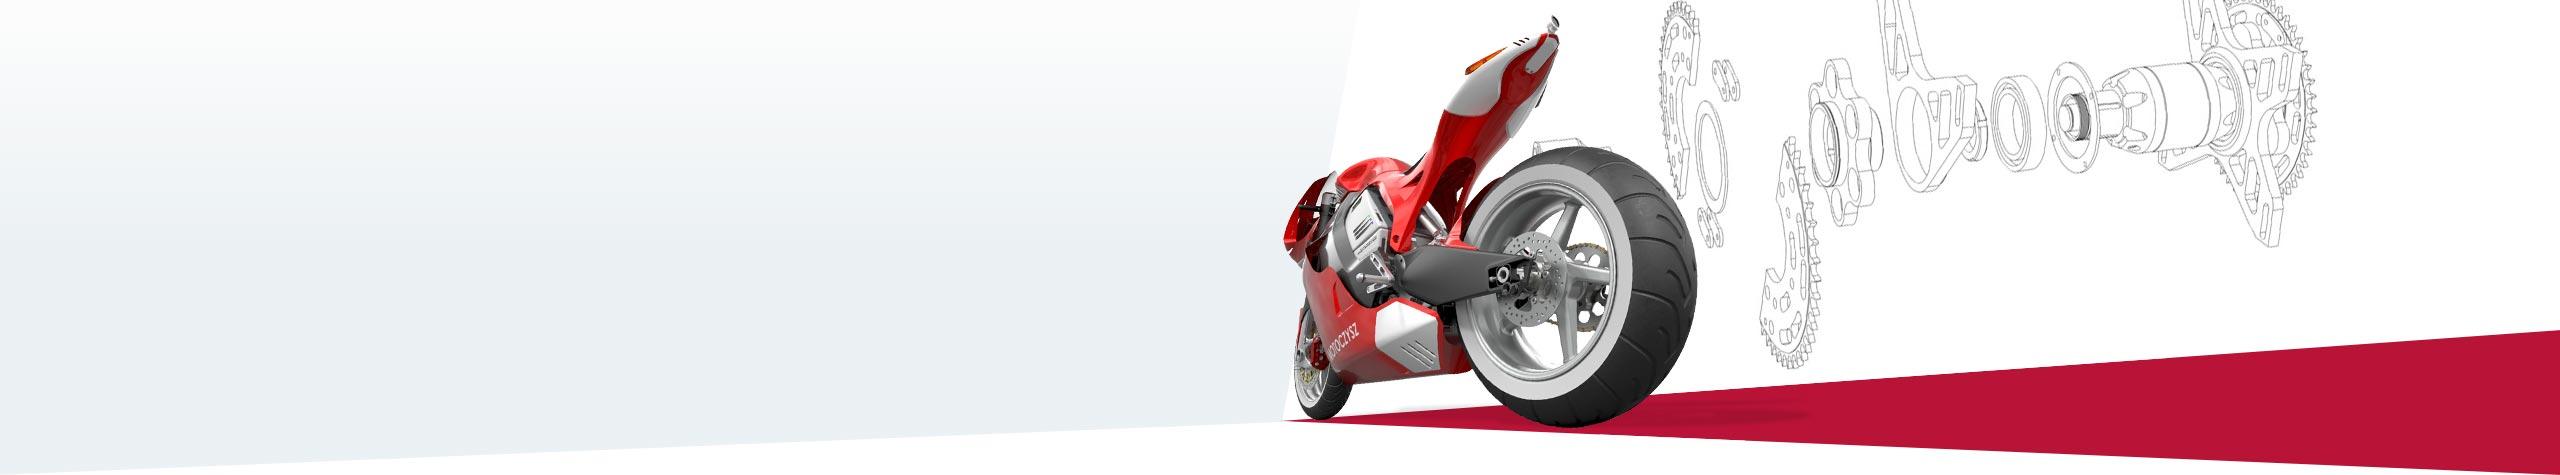 eDrawings So werden Ihre 2D- und 3D-Konstruktionen mobil.